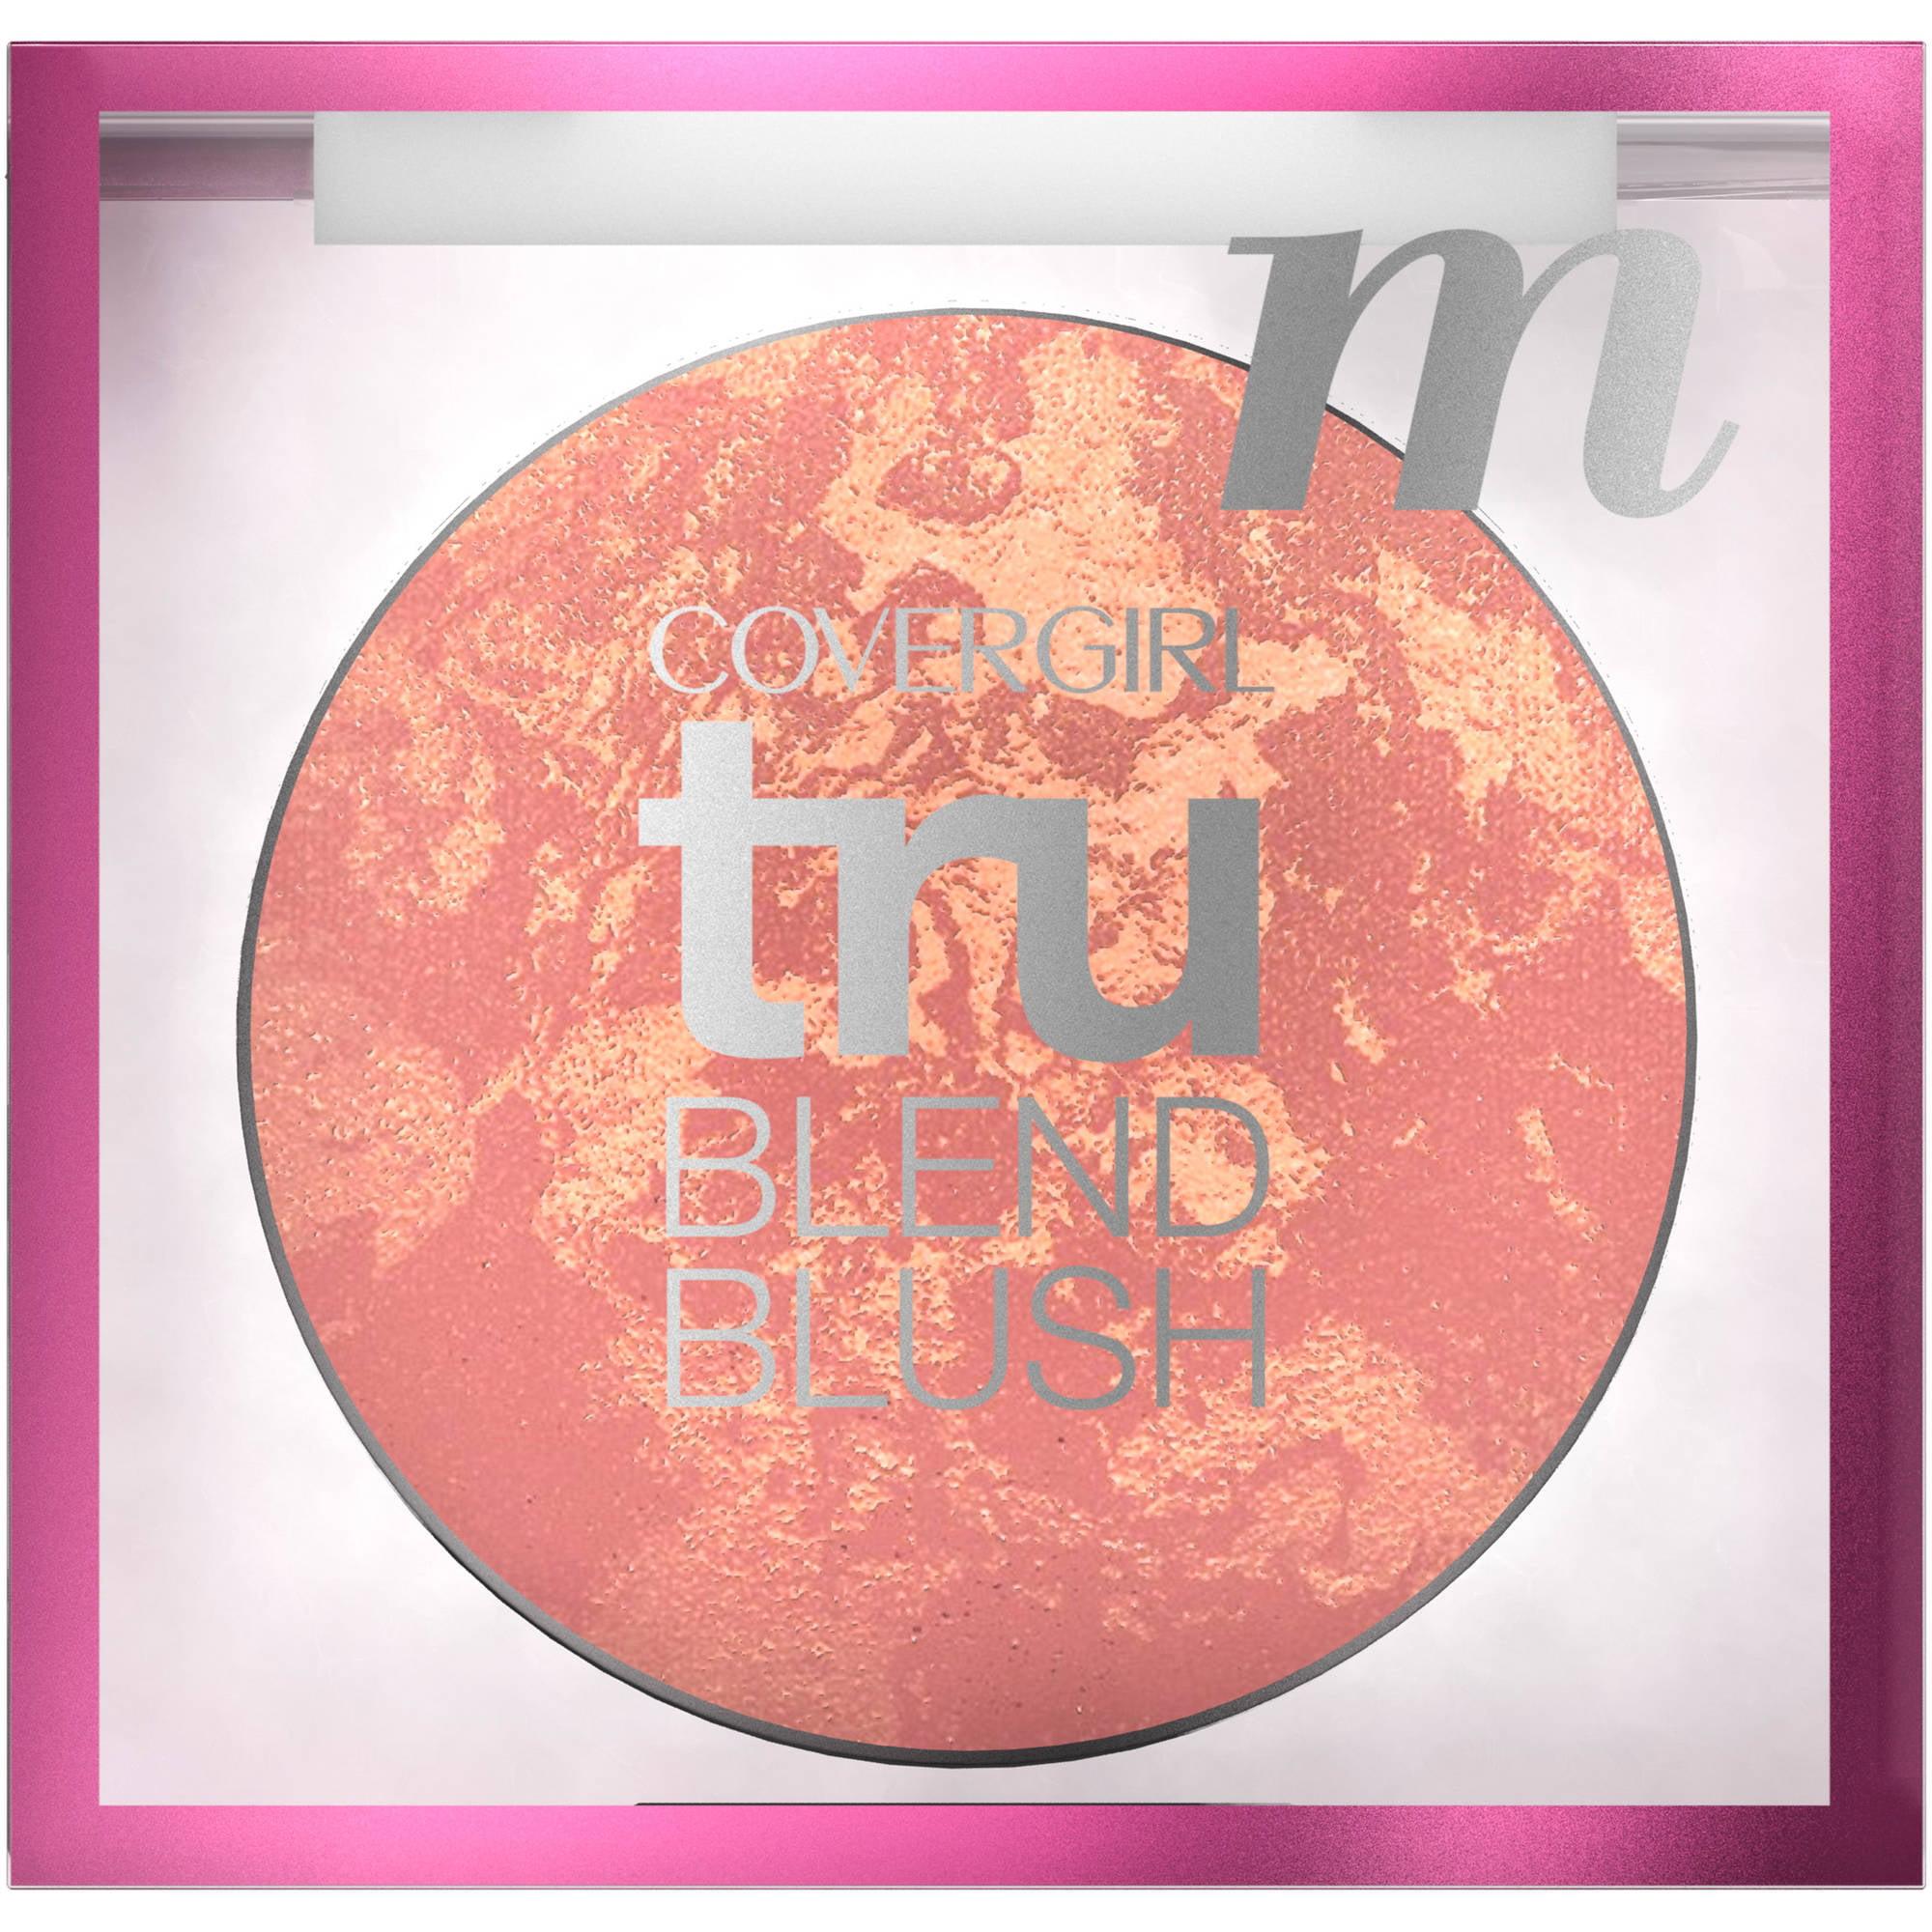 COVERGIRL truBlend Blush, Medium Rose, .1 oz